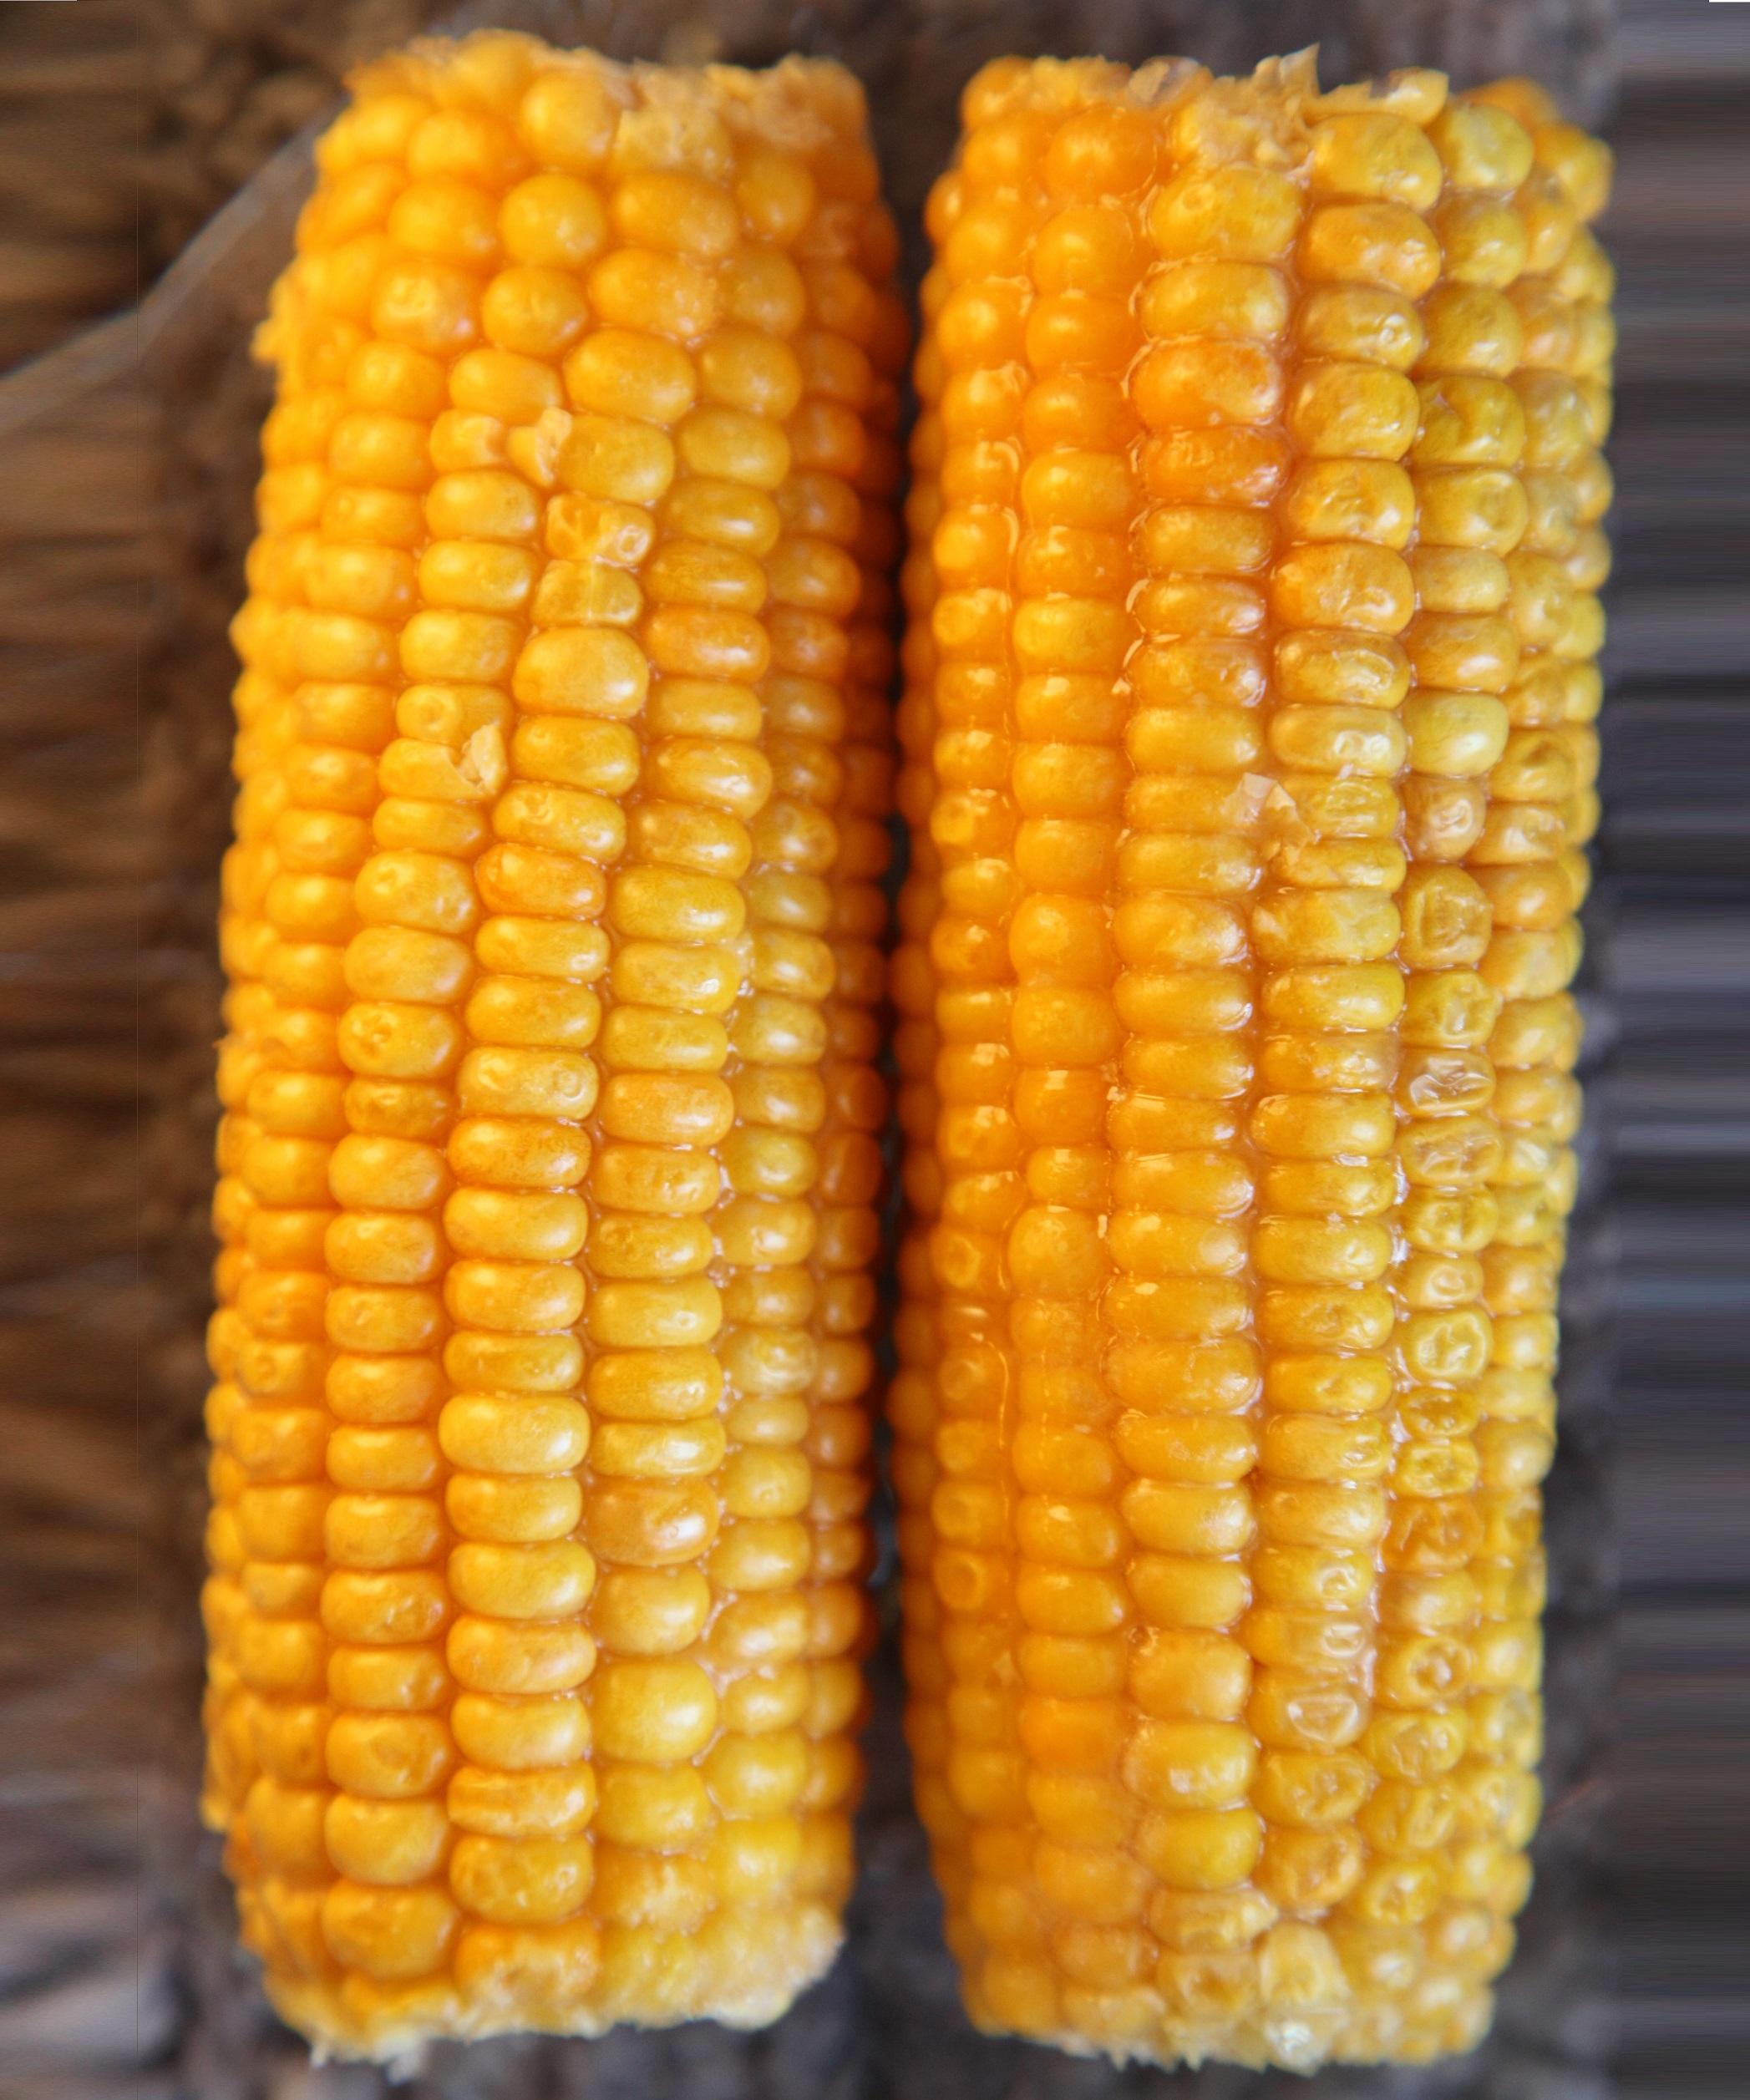 Maize - Agrisera antibodies